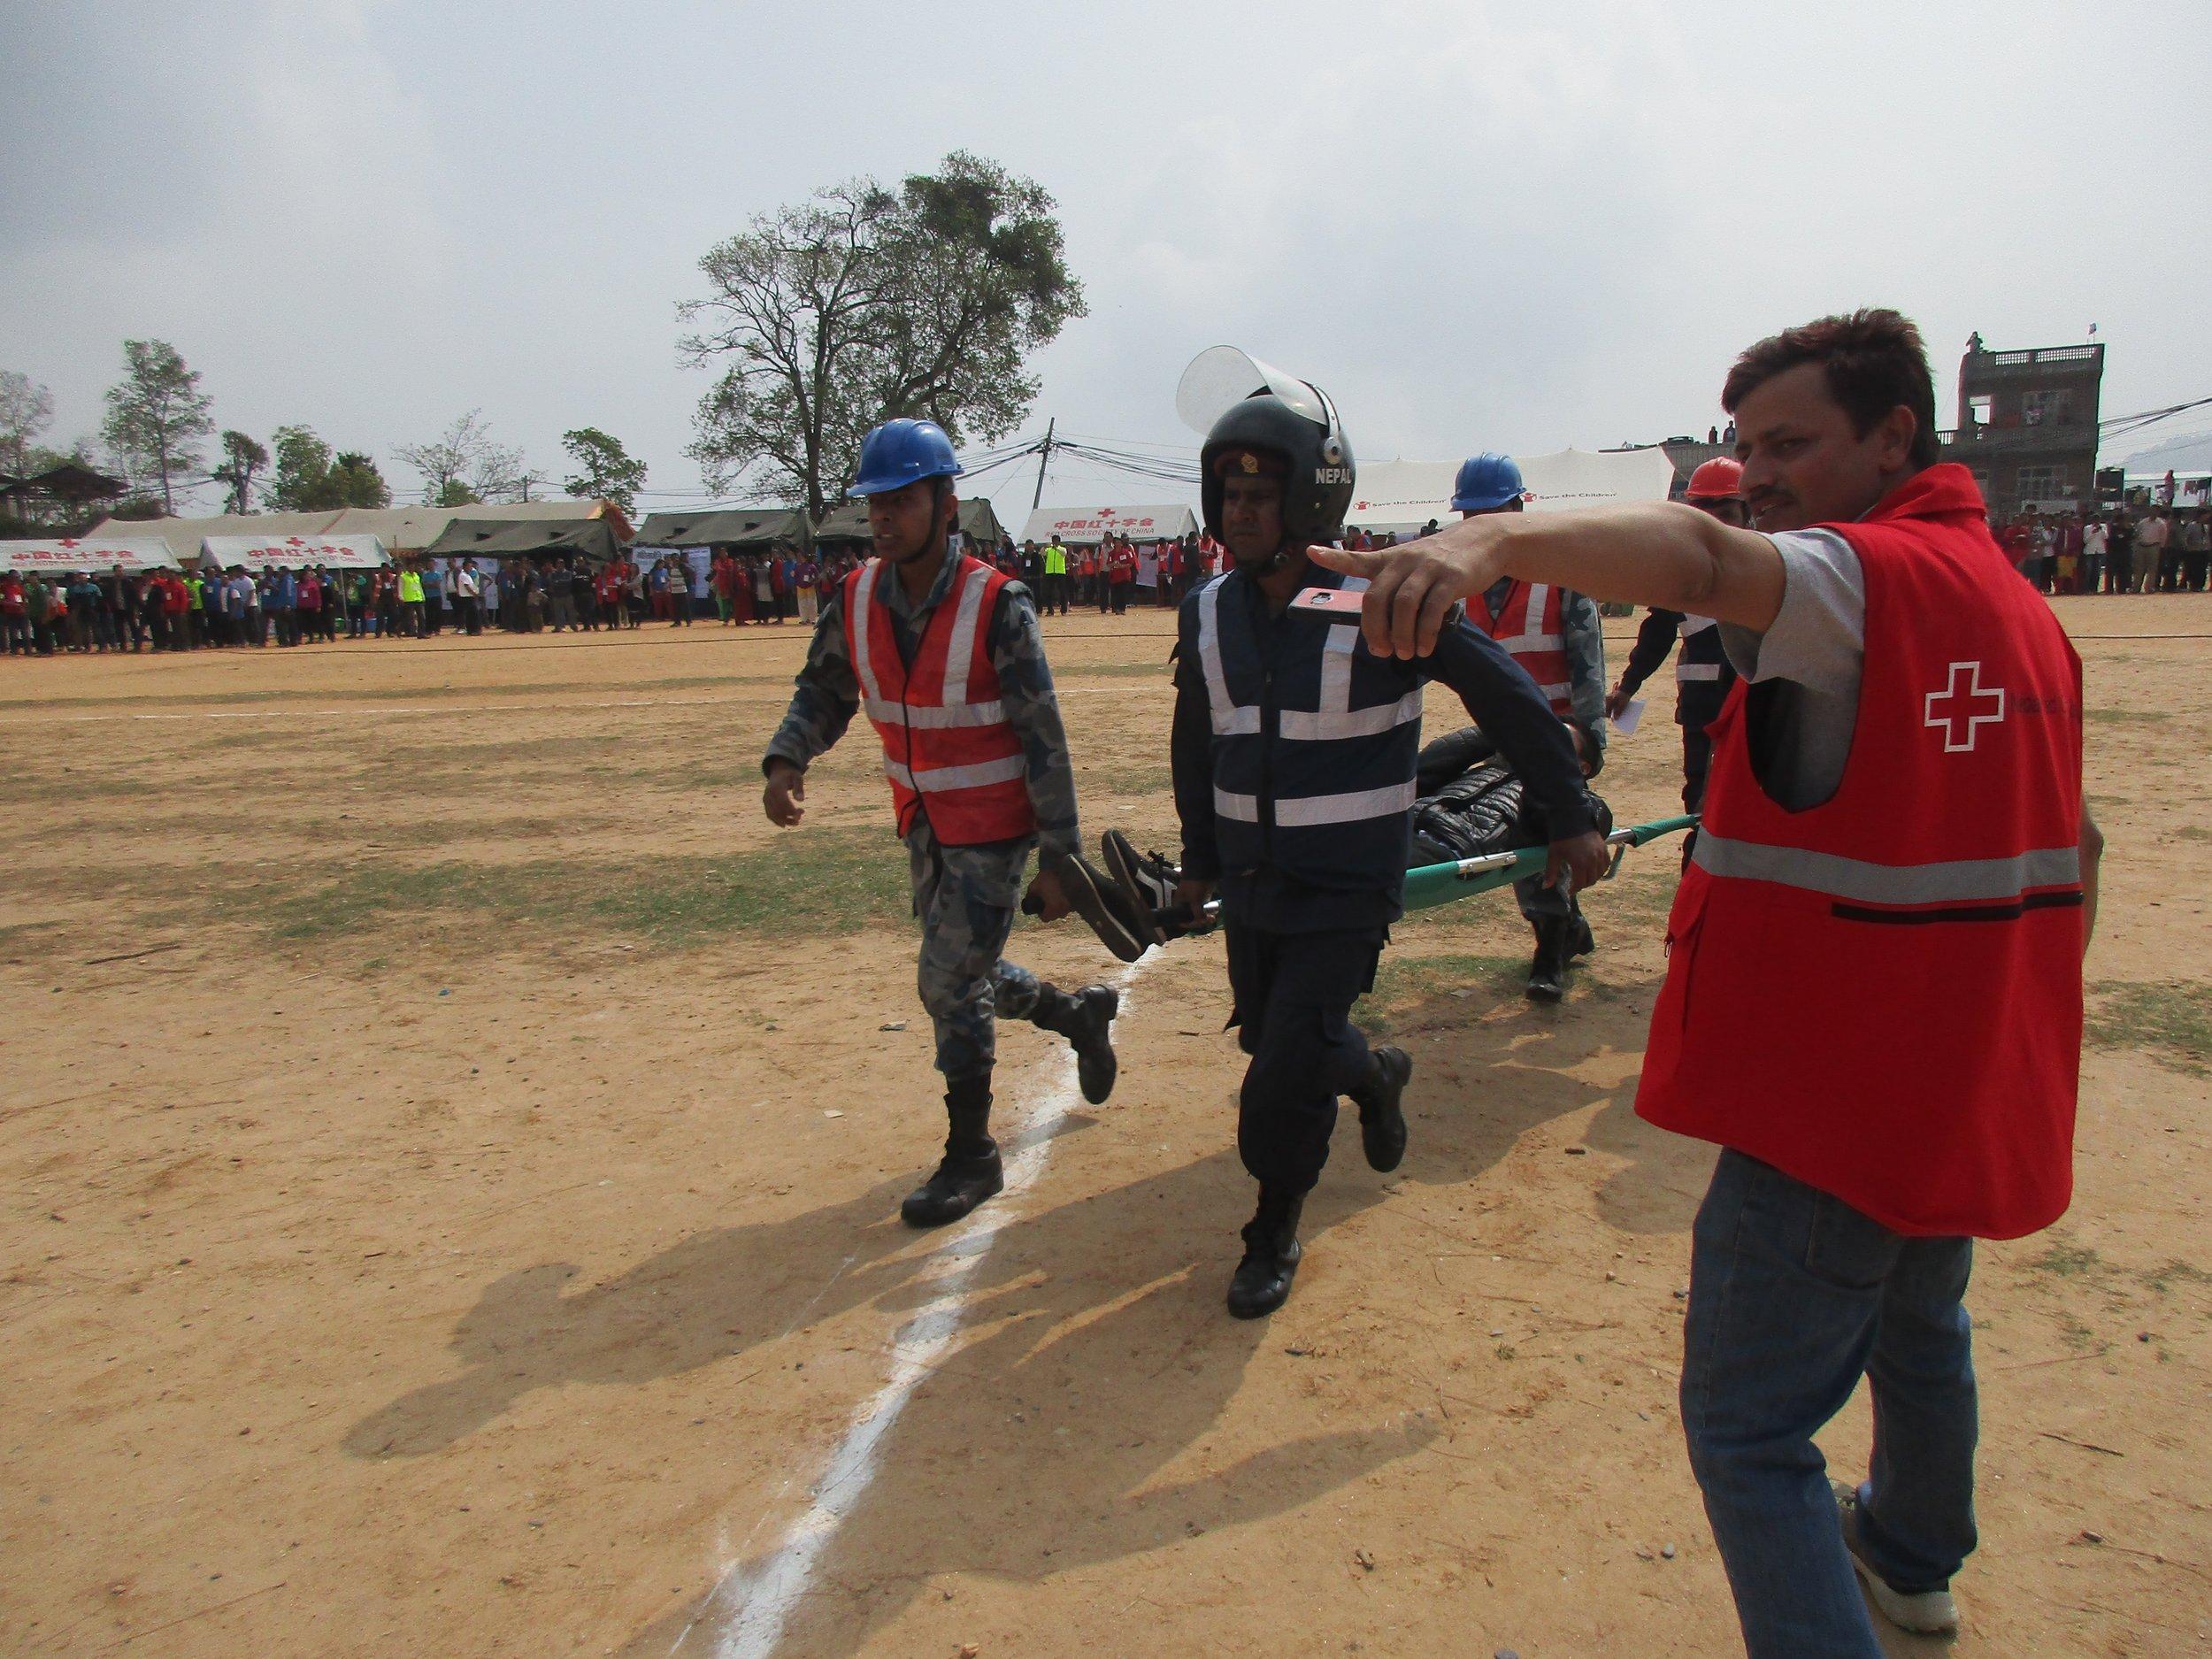 Eartquake simulation, Chautara, Nepal. Photo: Kathrine O. Flaate.